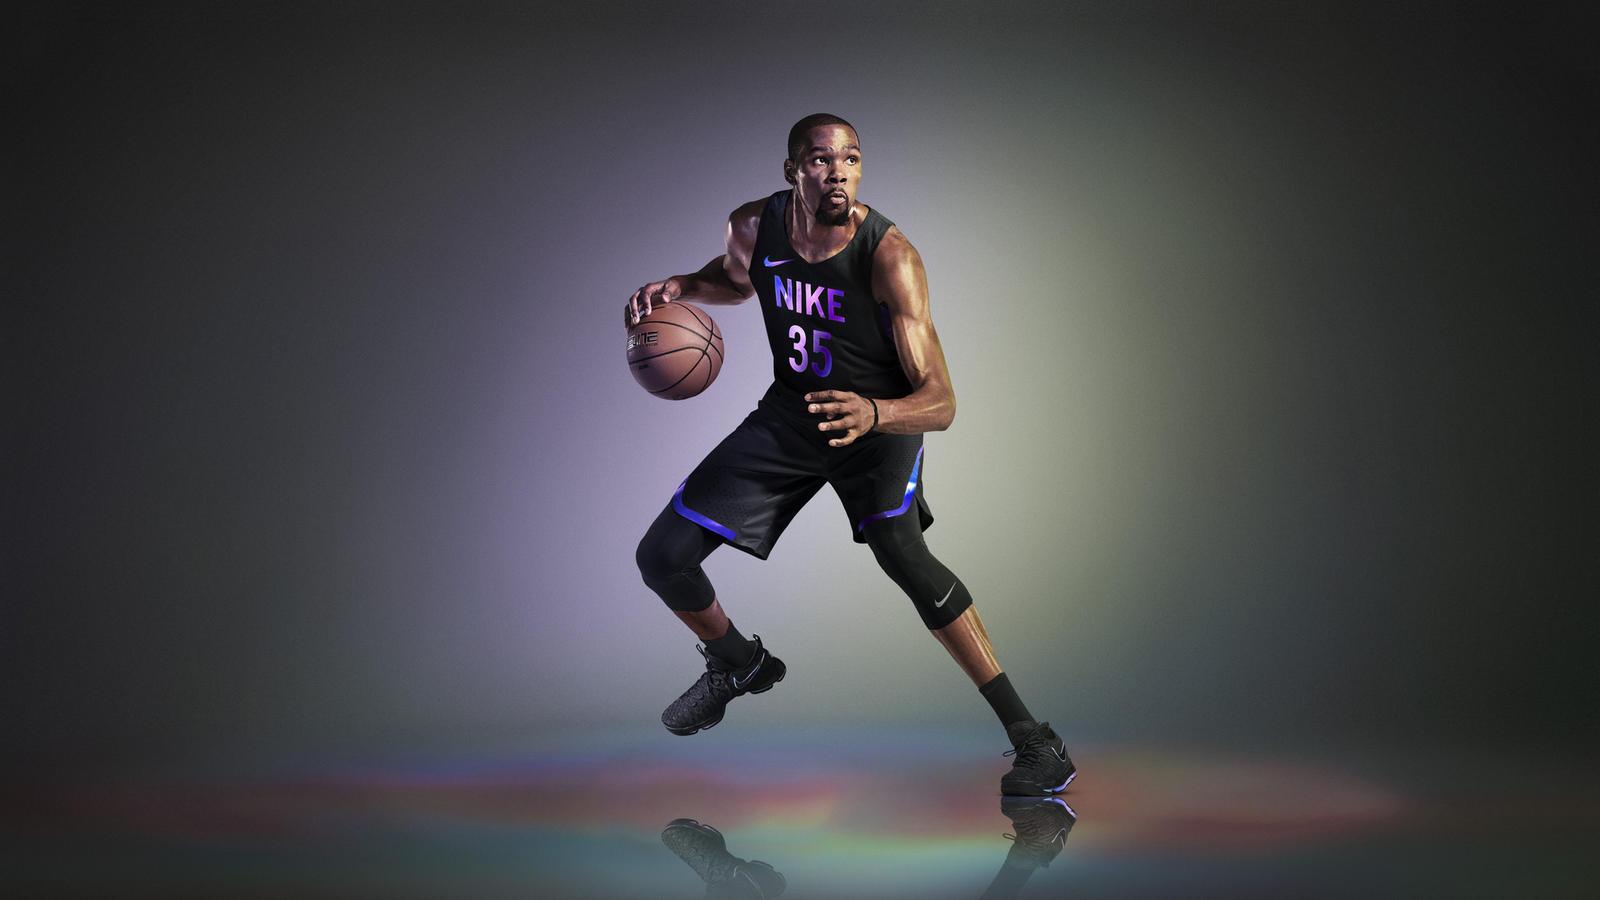 And A Uniforms Evolves News Short Beyond Basketball Nike Jersey TYwqIq